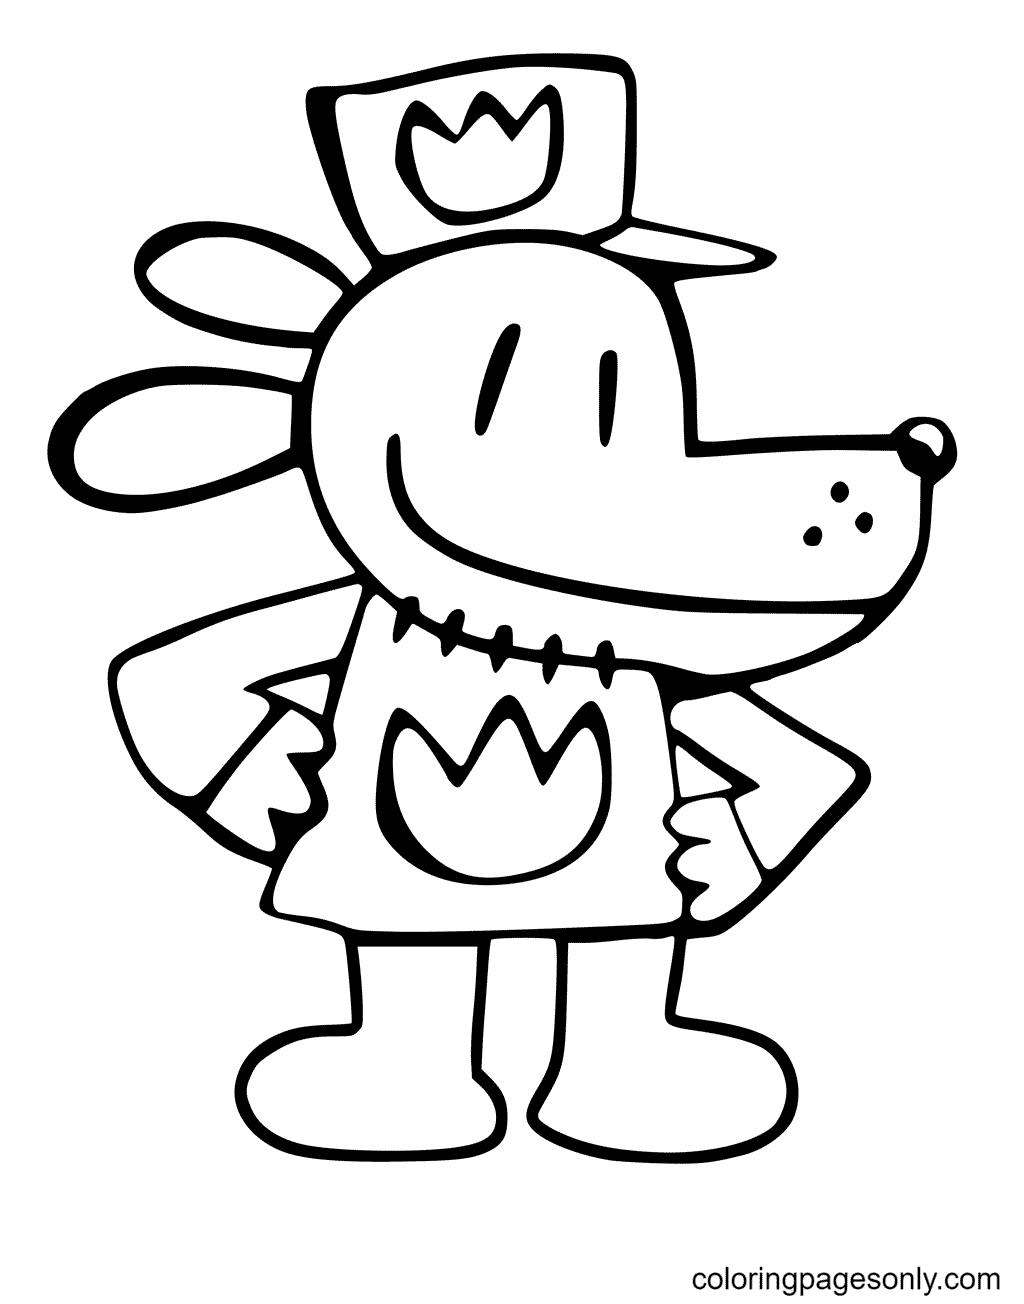 Dog Man Coloring Page